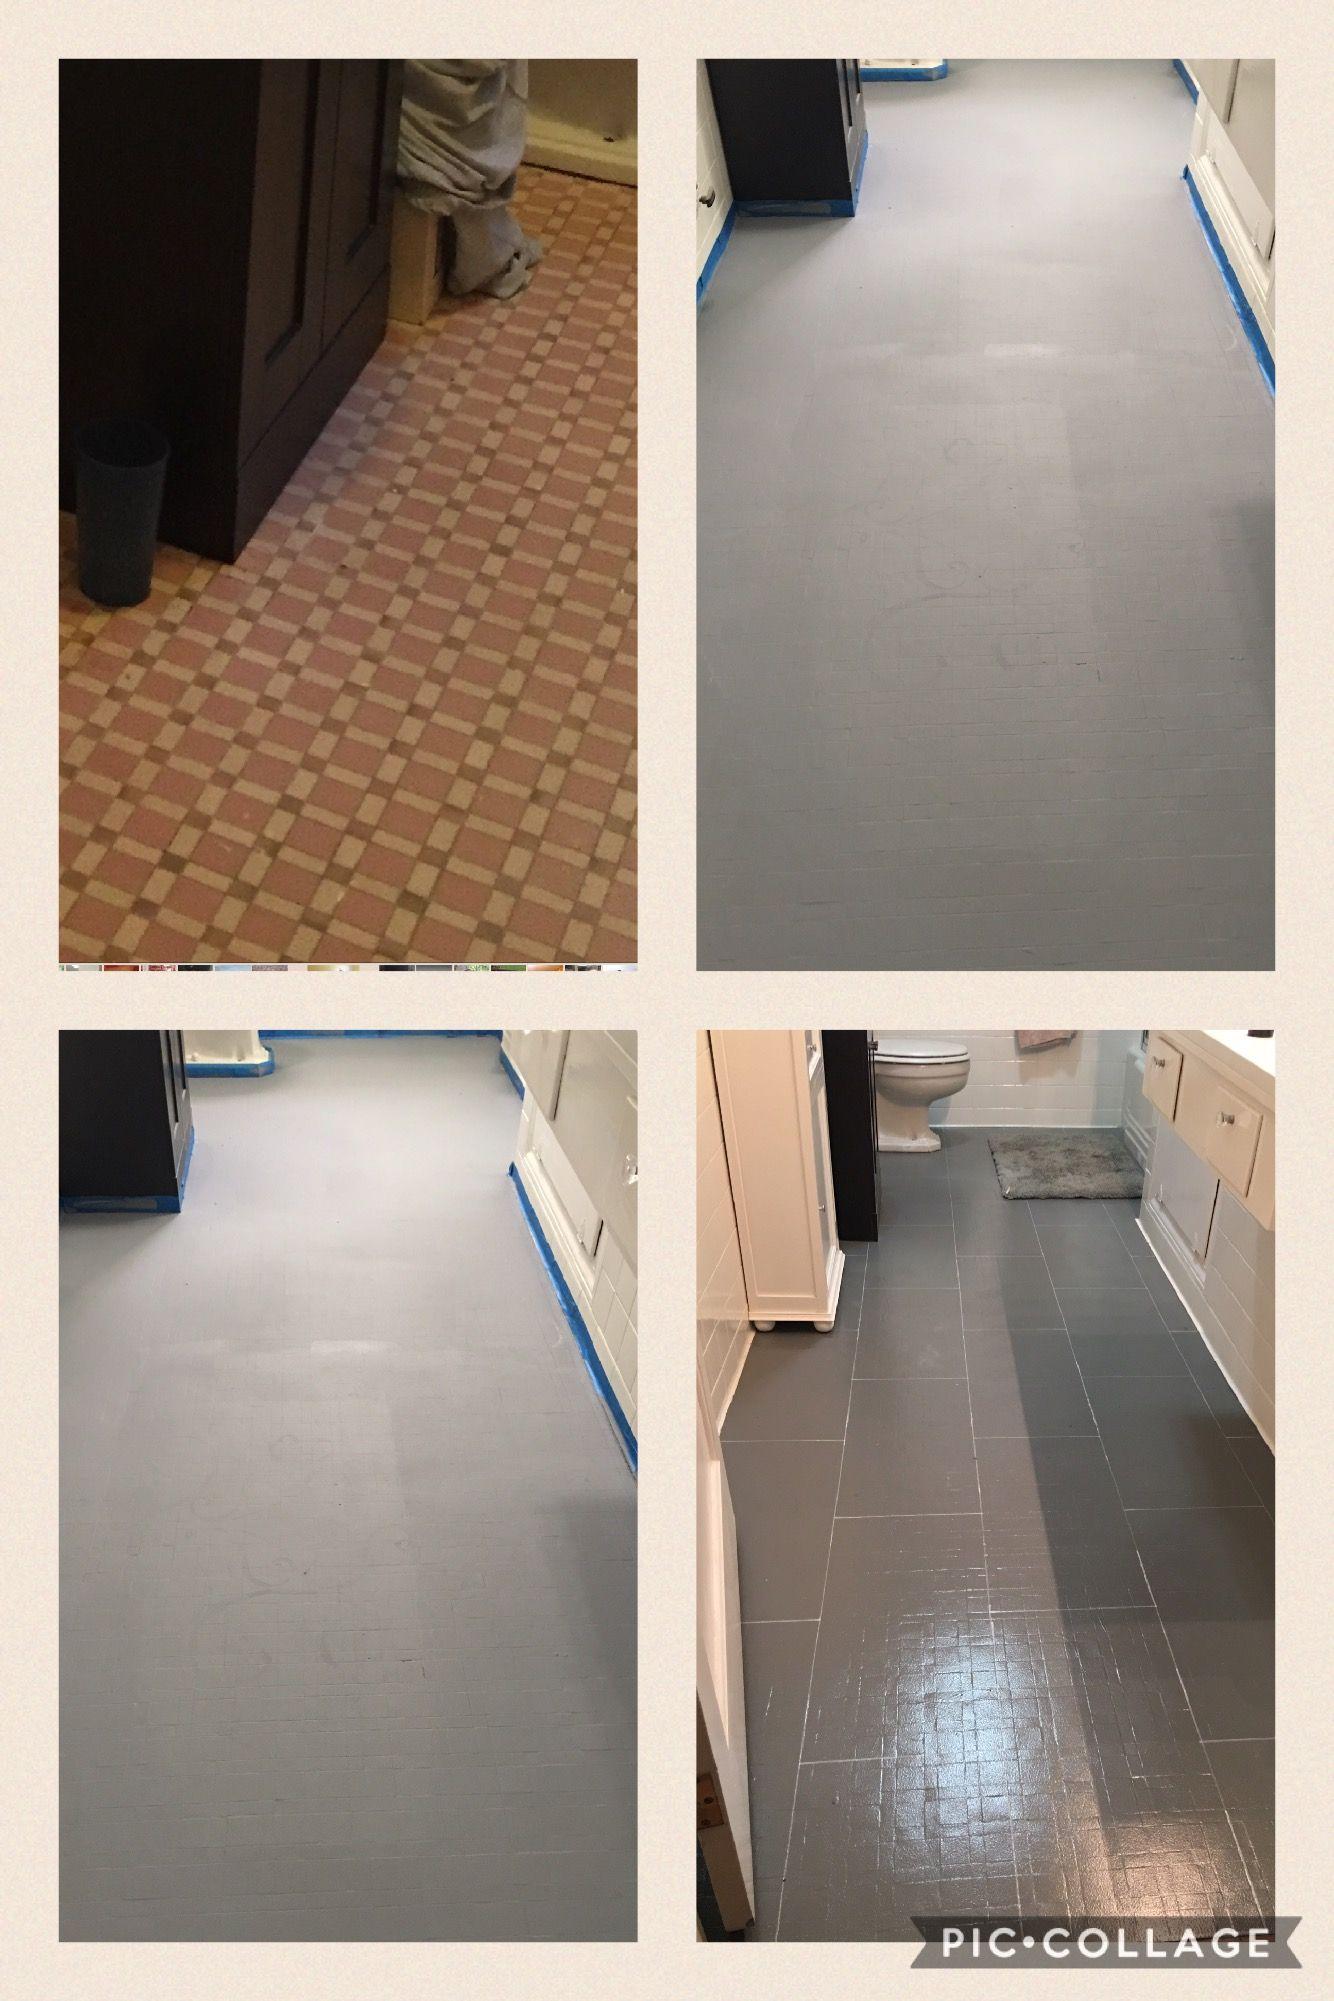 Painted Tile Floor Tinted Zinzser Primer 1coat 2 Coats Valspar Paint Sharpie Marker For Faux Lines Of Poly